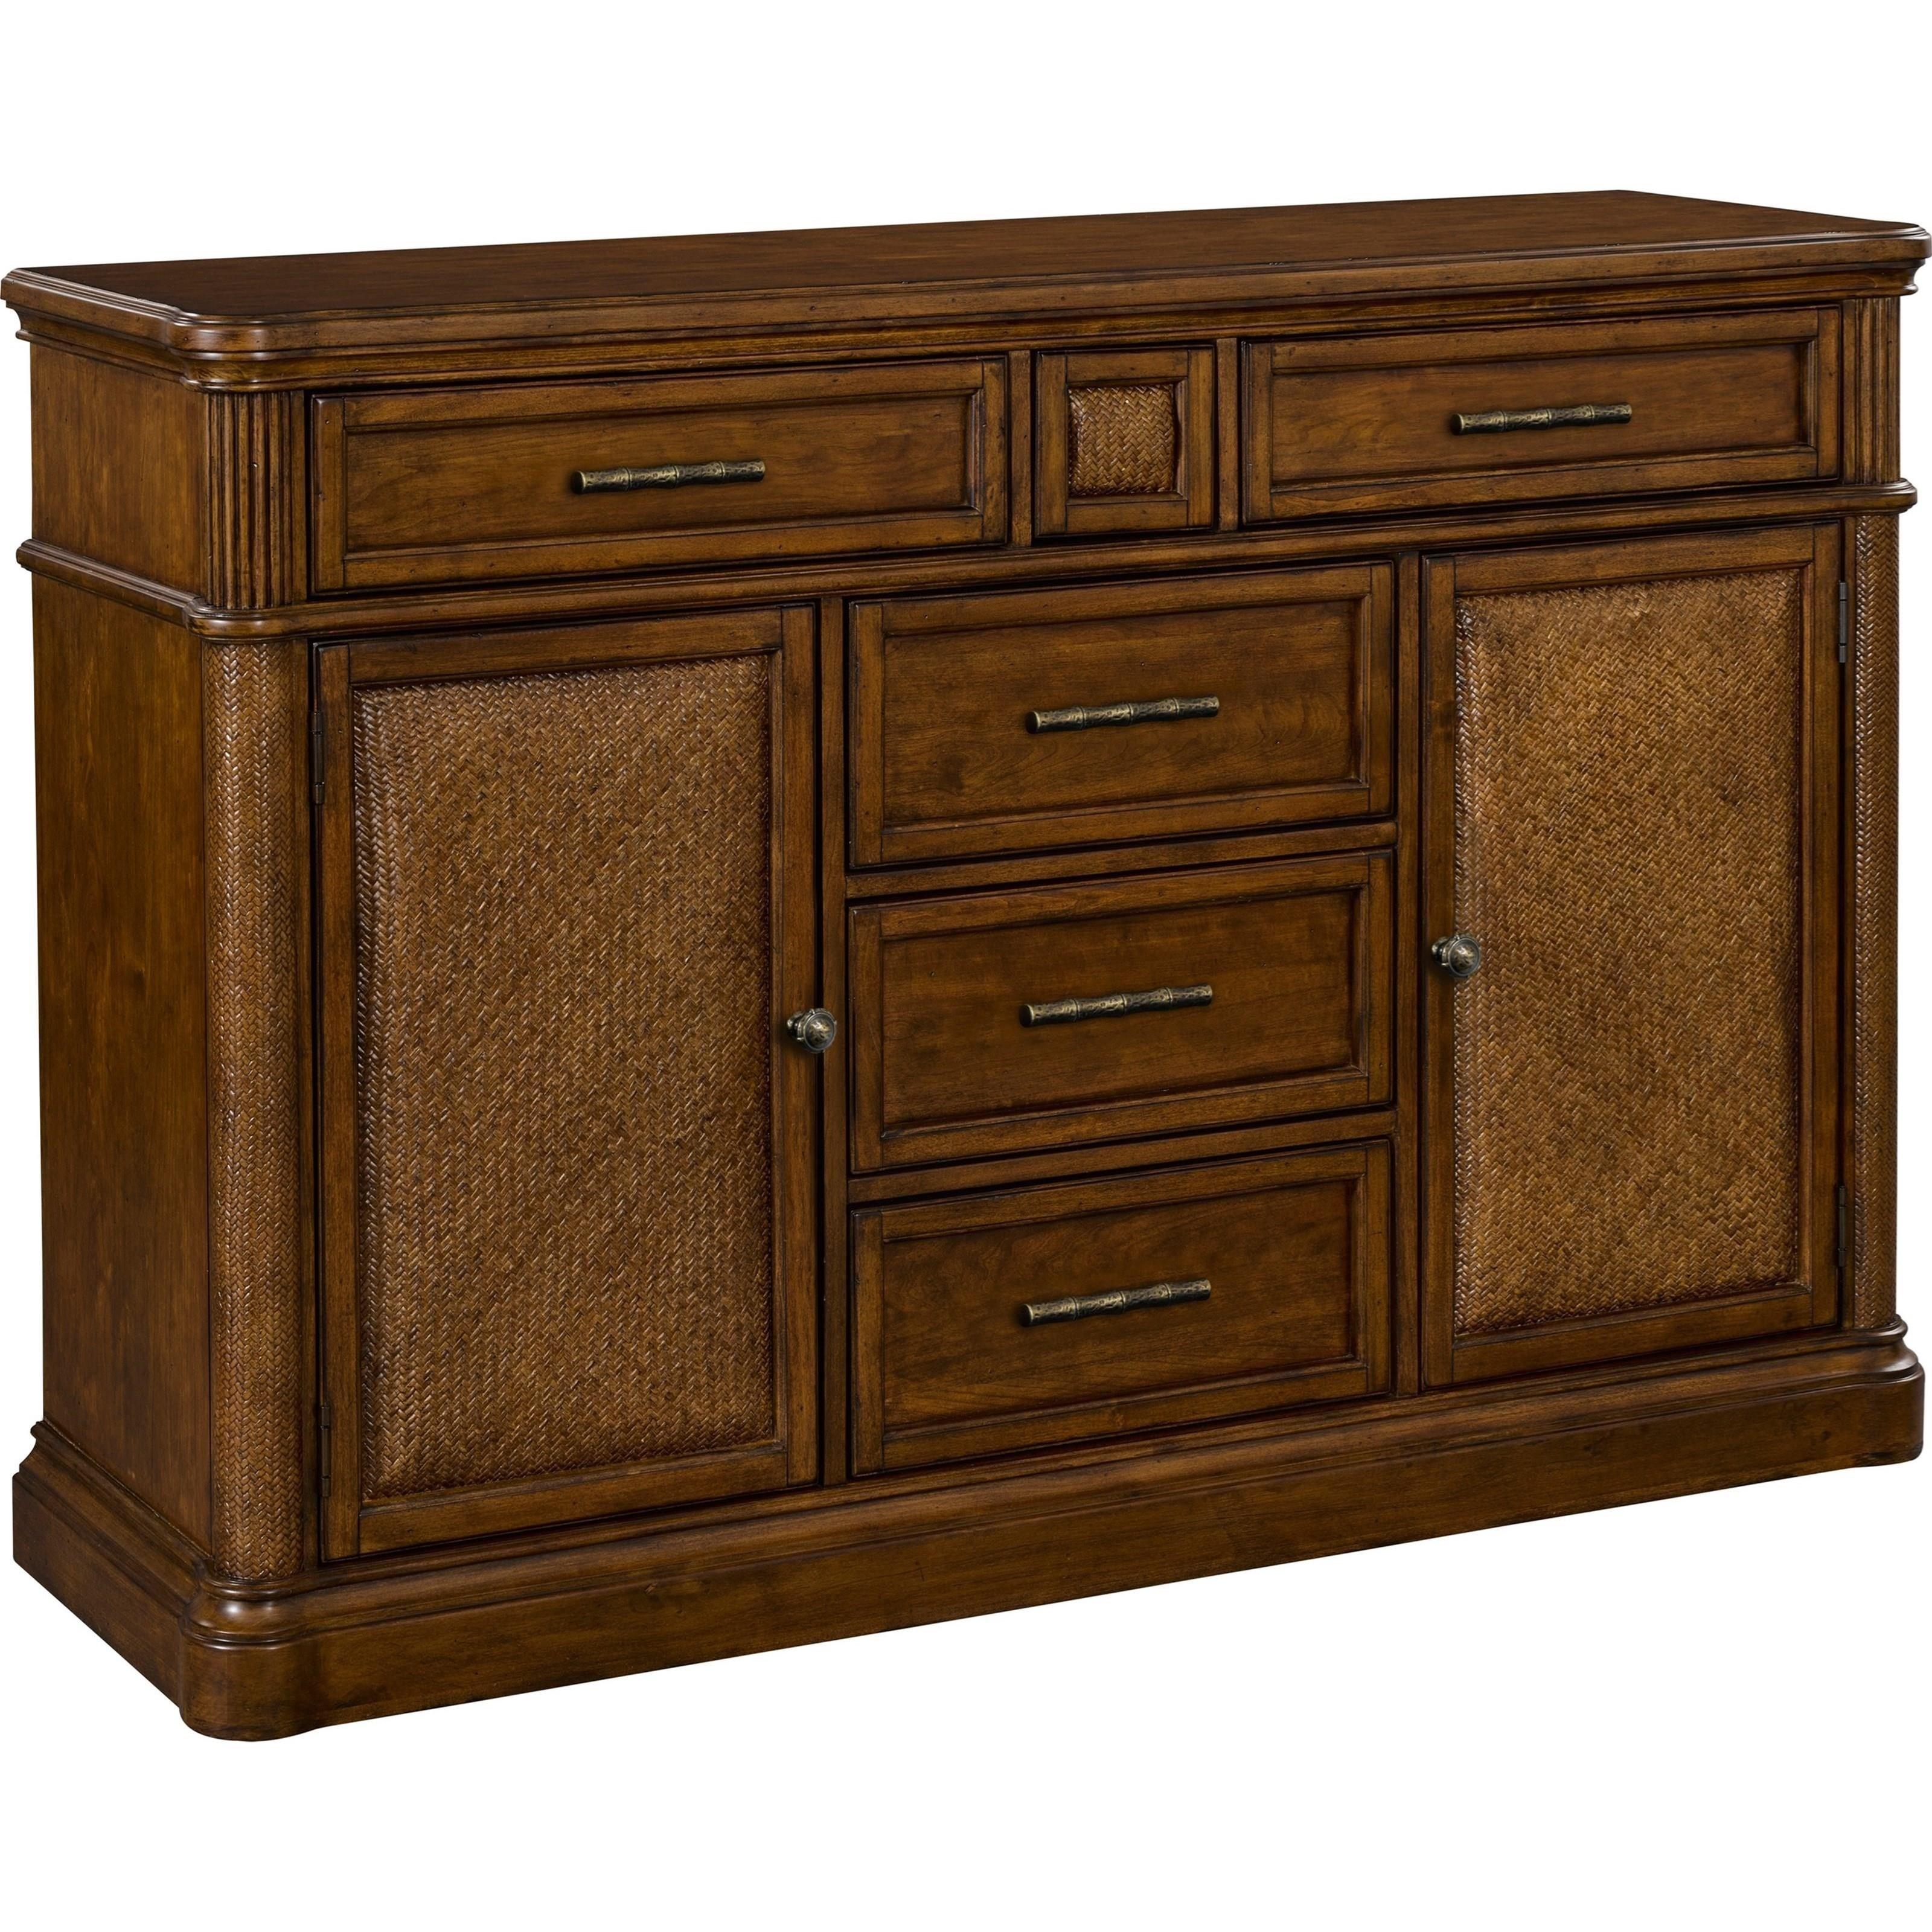 Broyhill Furniture Amalie Bay Sideboard - Item Number: 4548-513